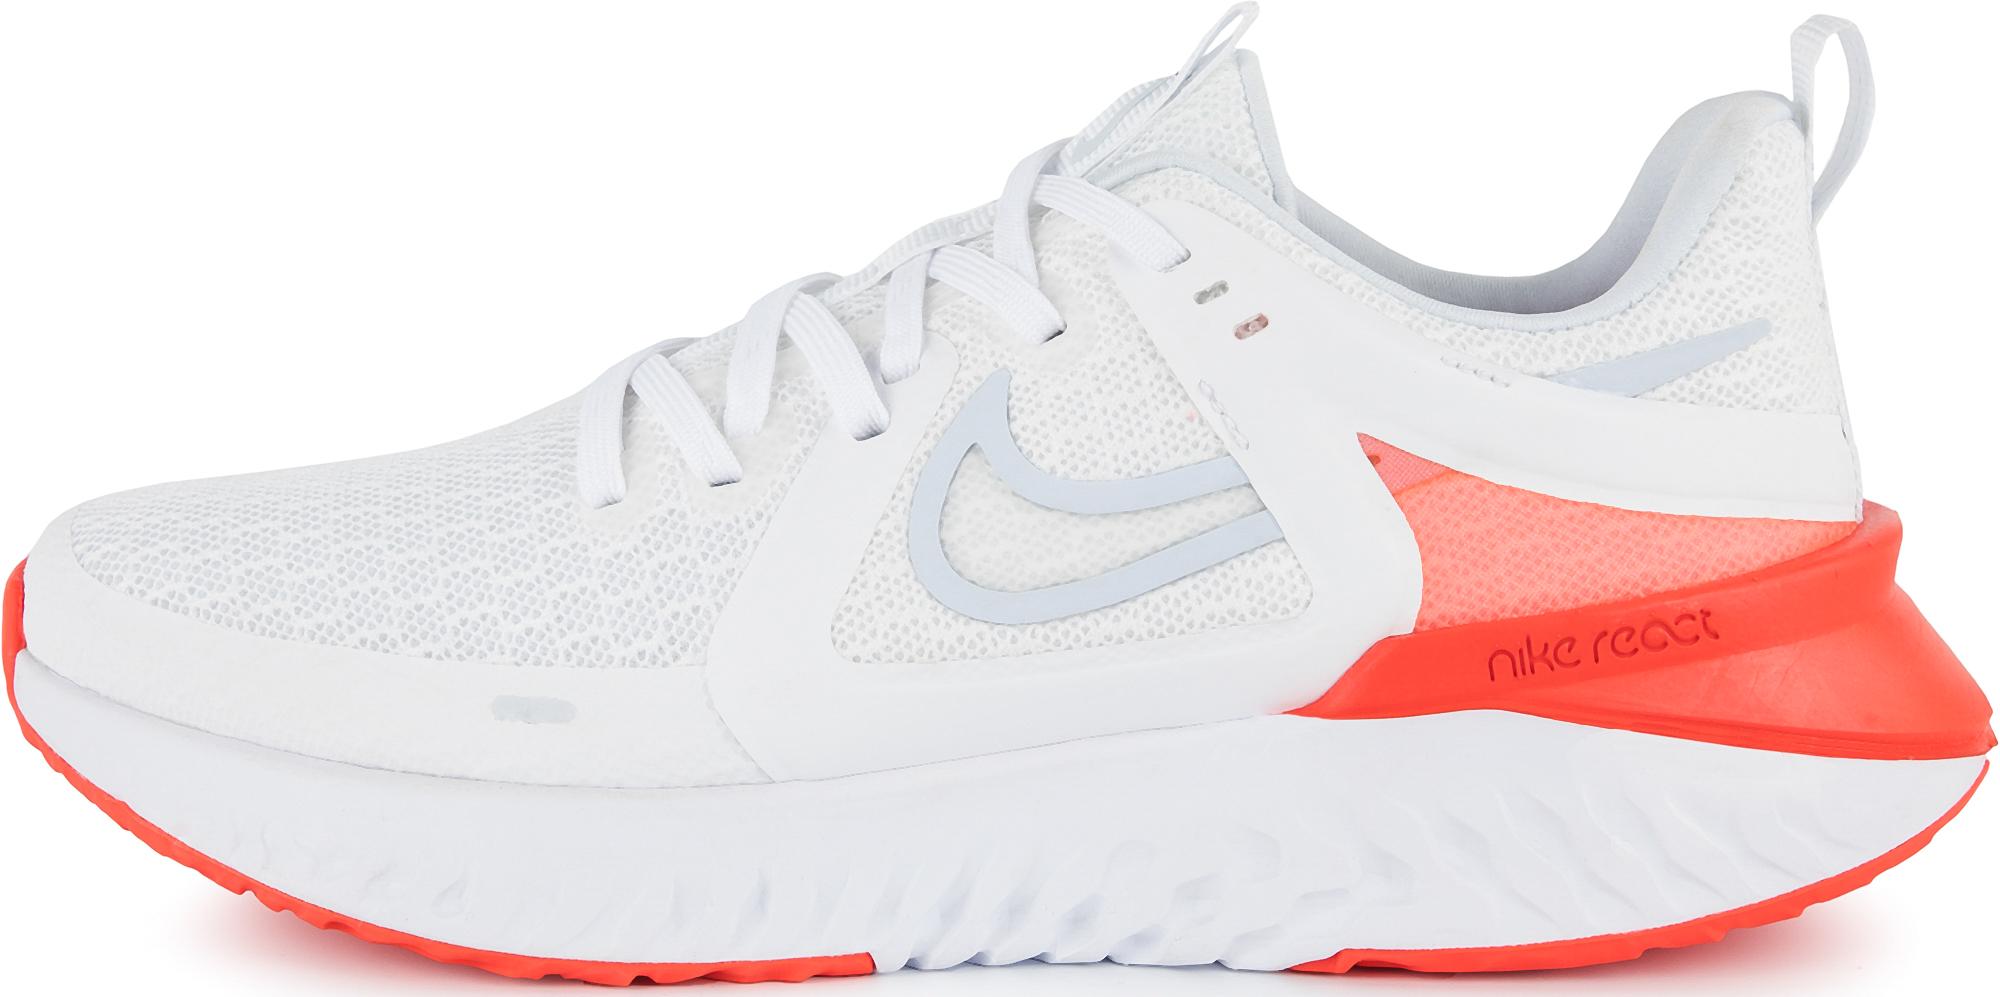 Nike Кроссовки женские Nike Legend React 2, размер 40